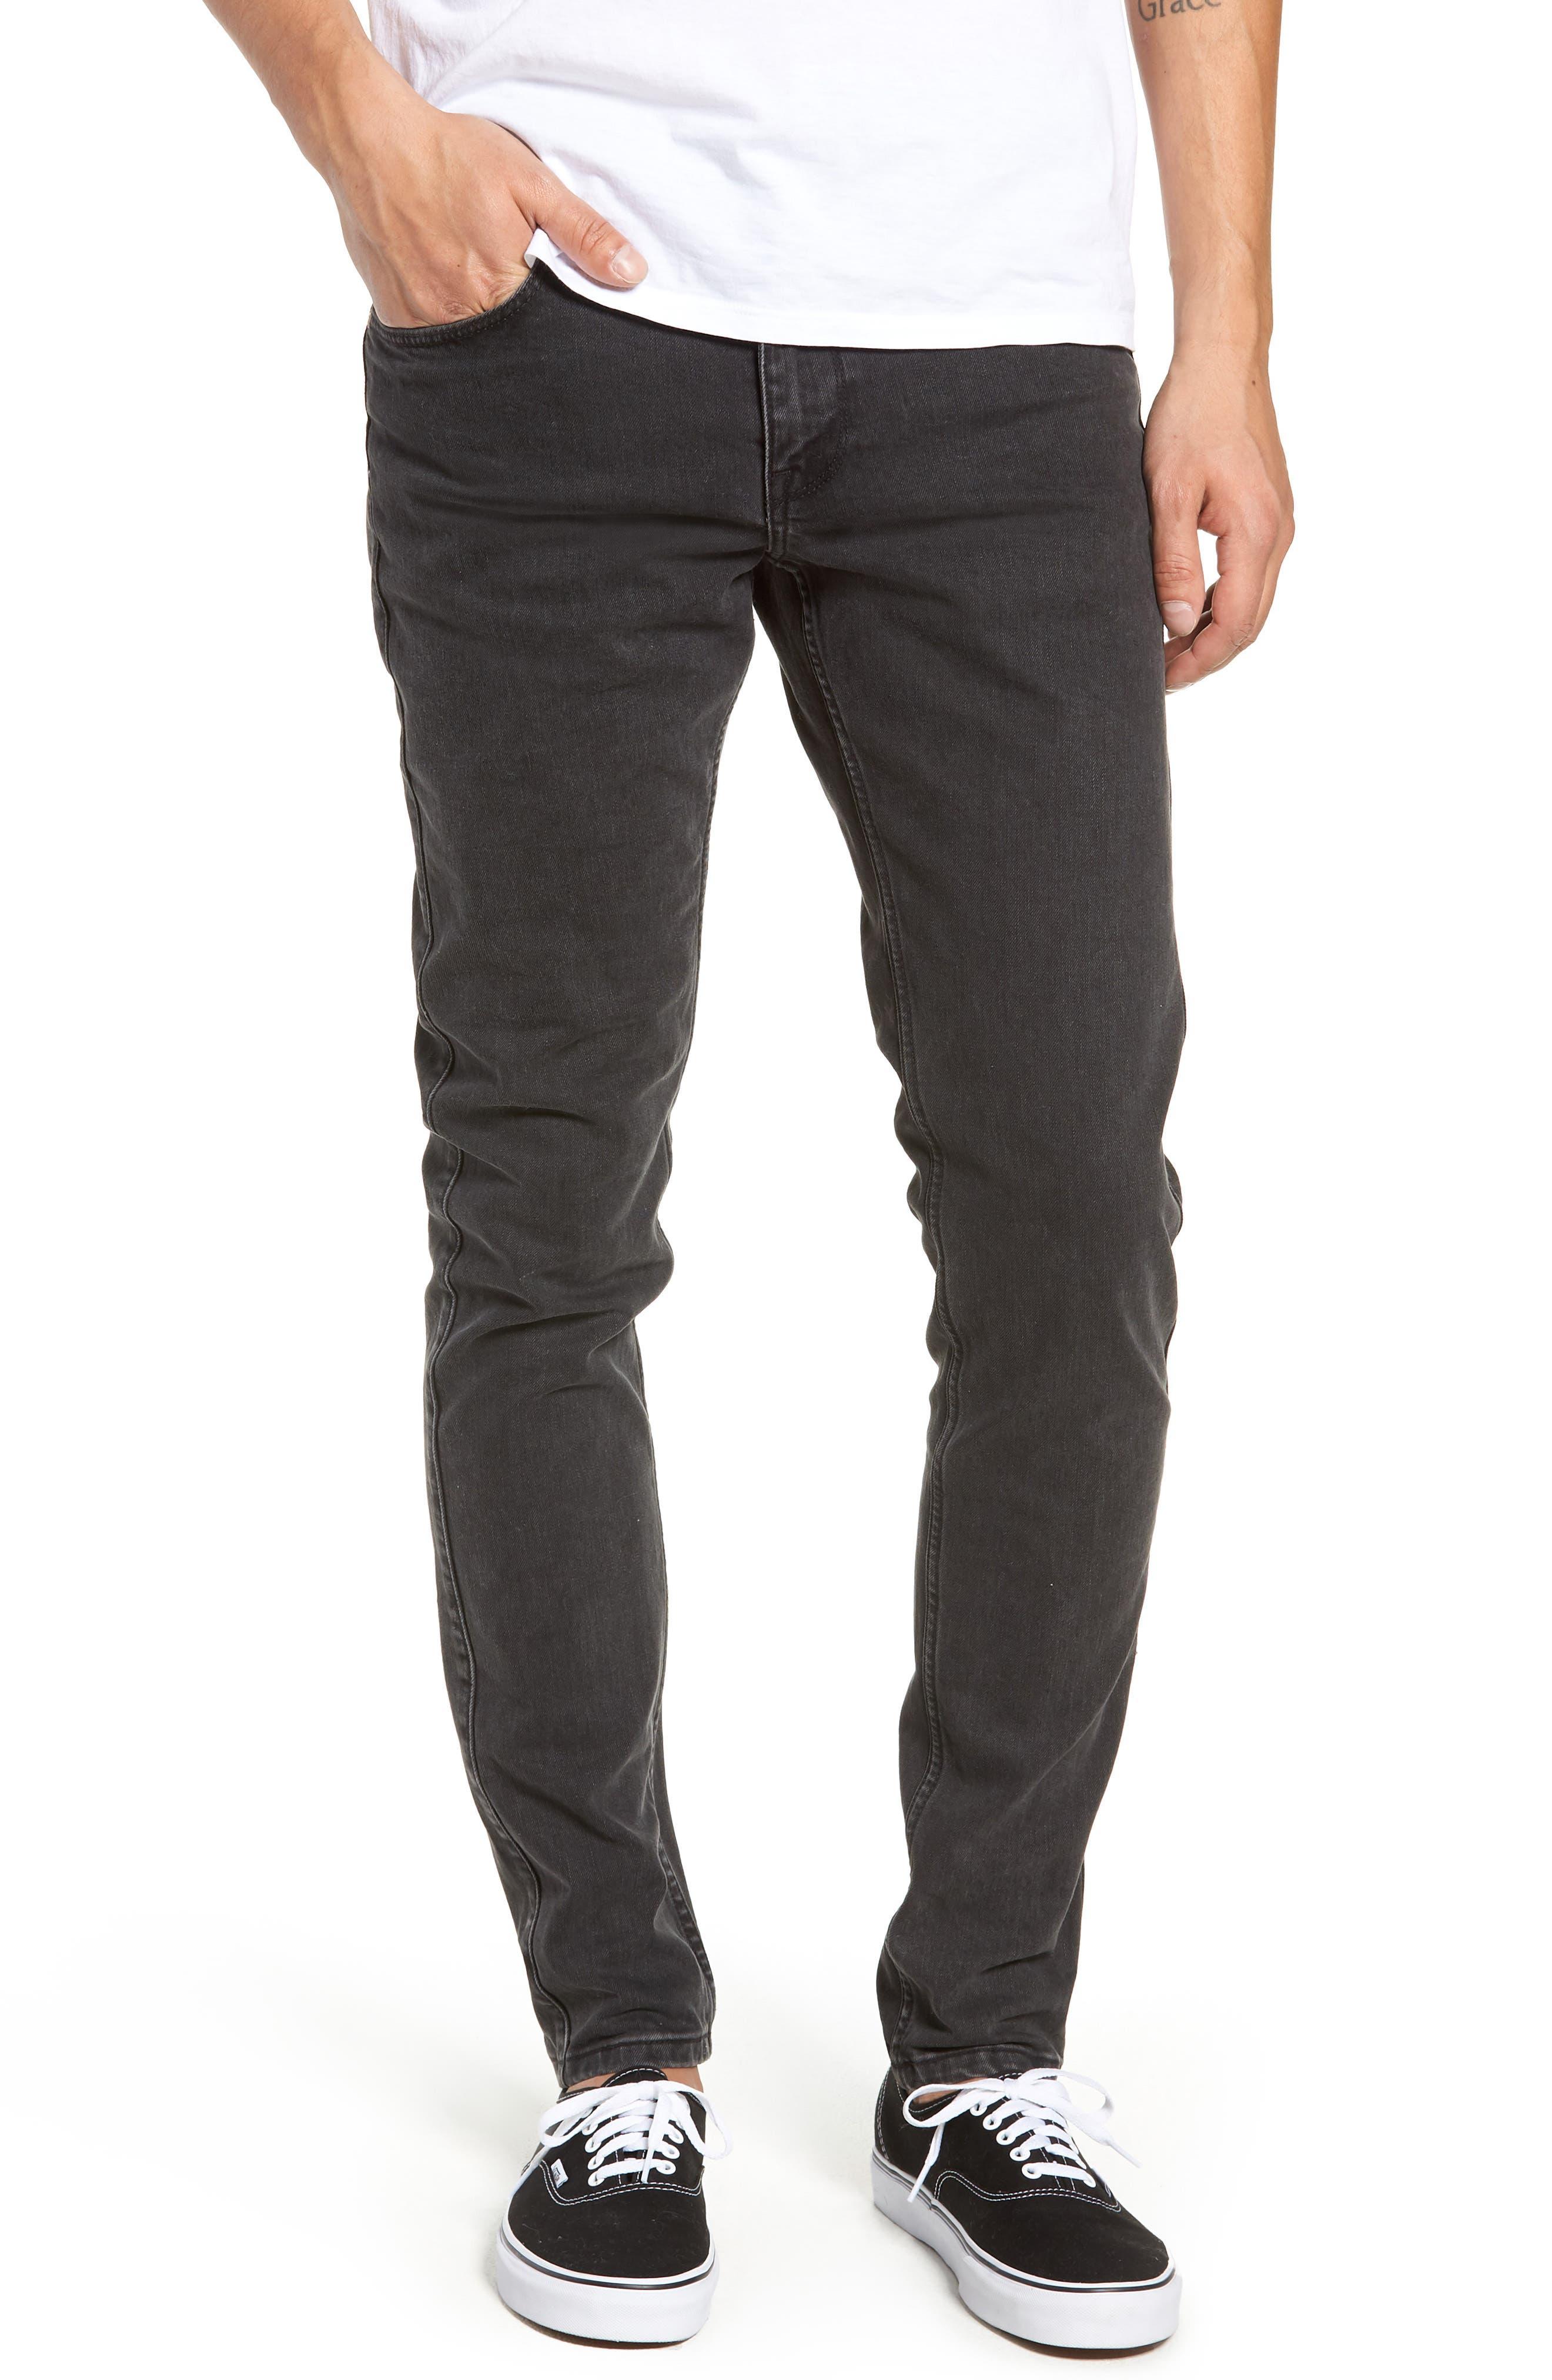 Clark Slim Straight Leg Jeans,                             Main thumbnail 1, color,                             Black Vintage